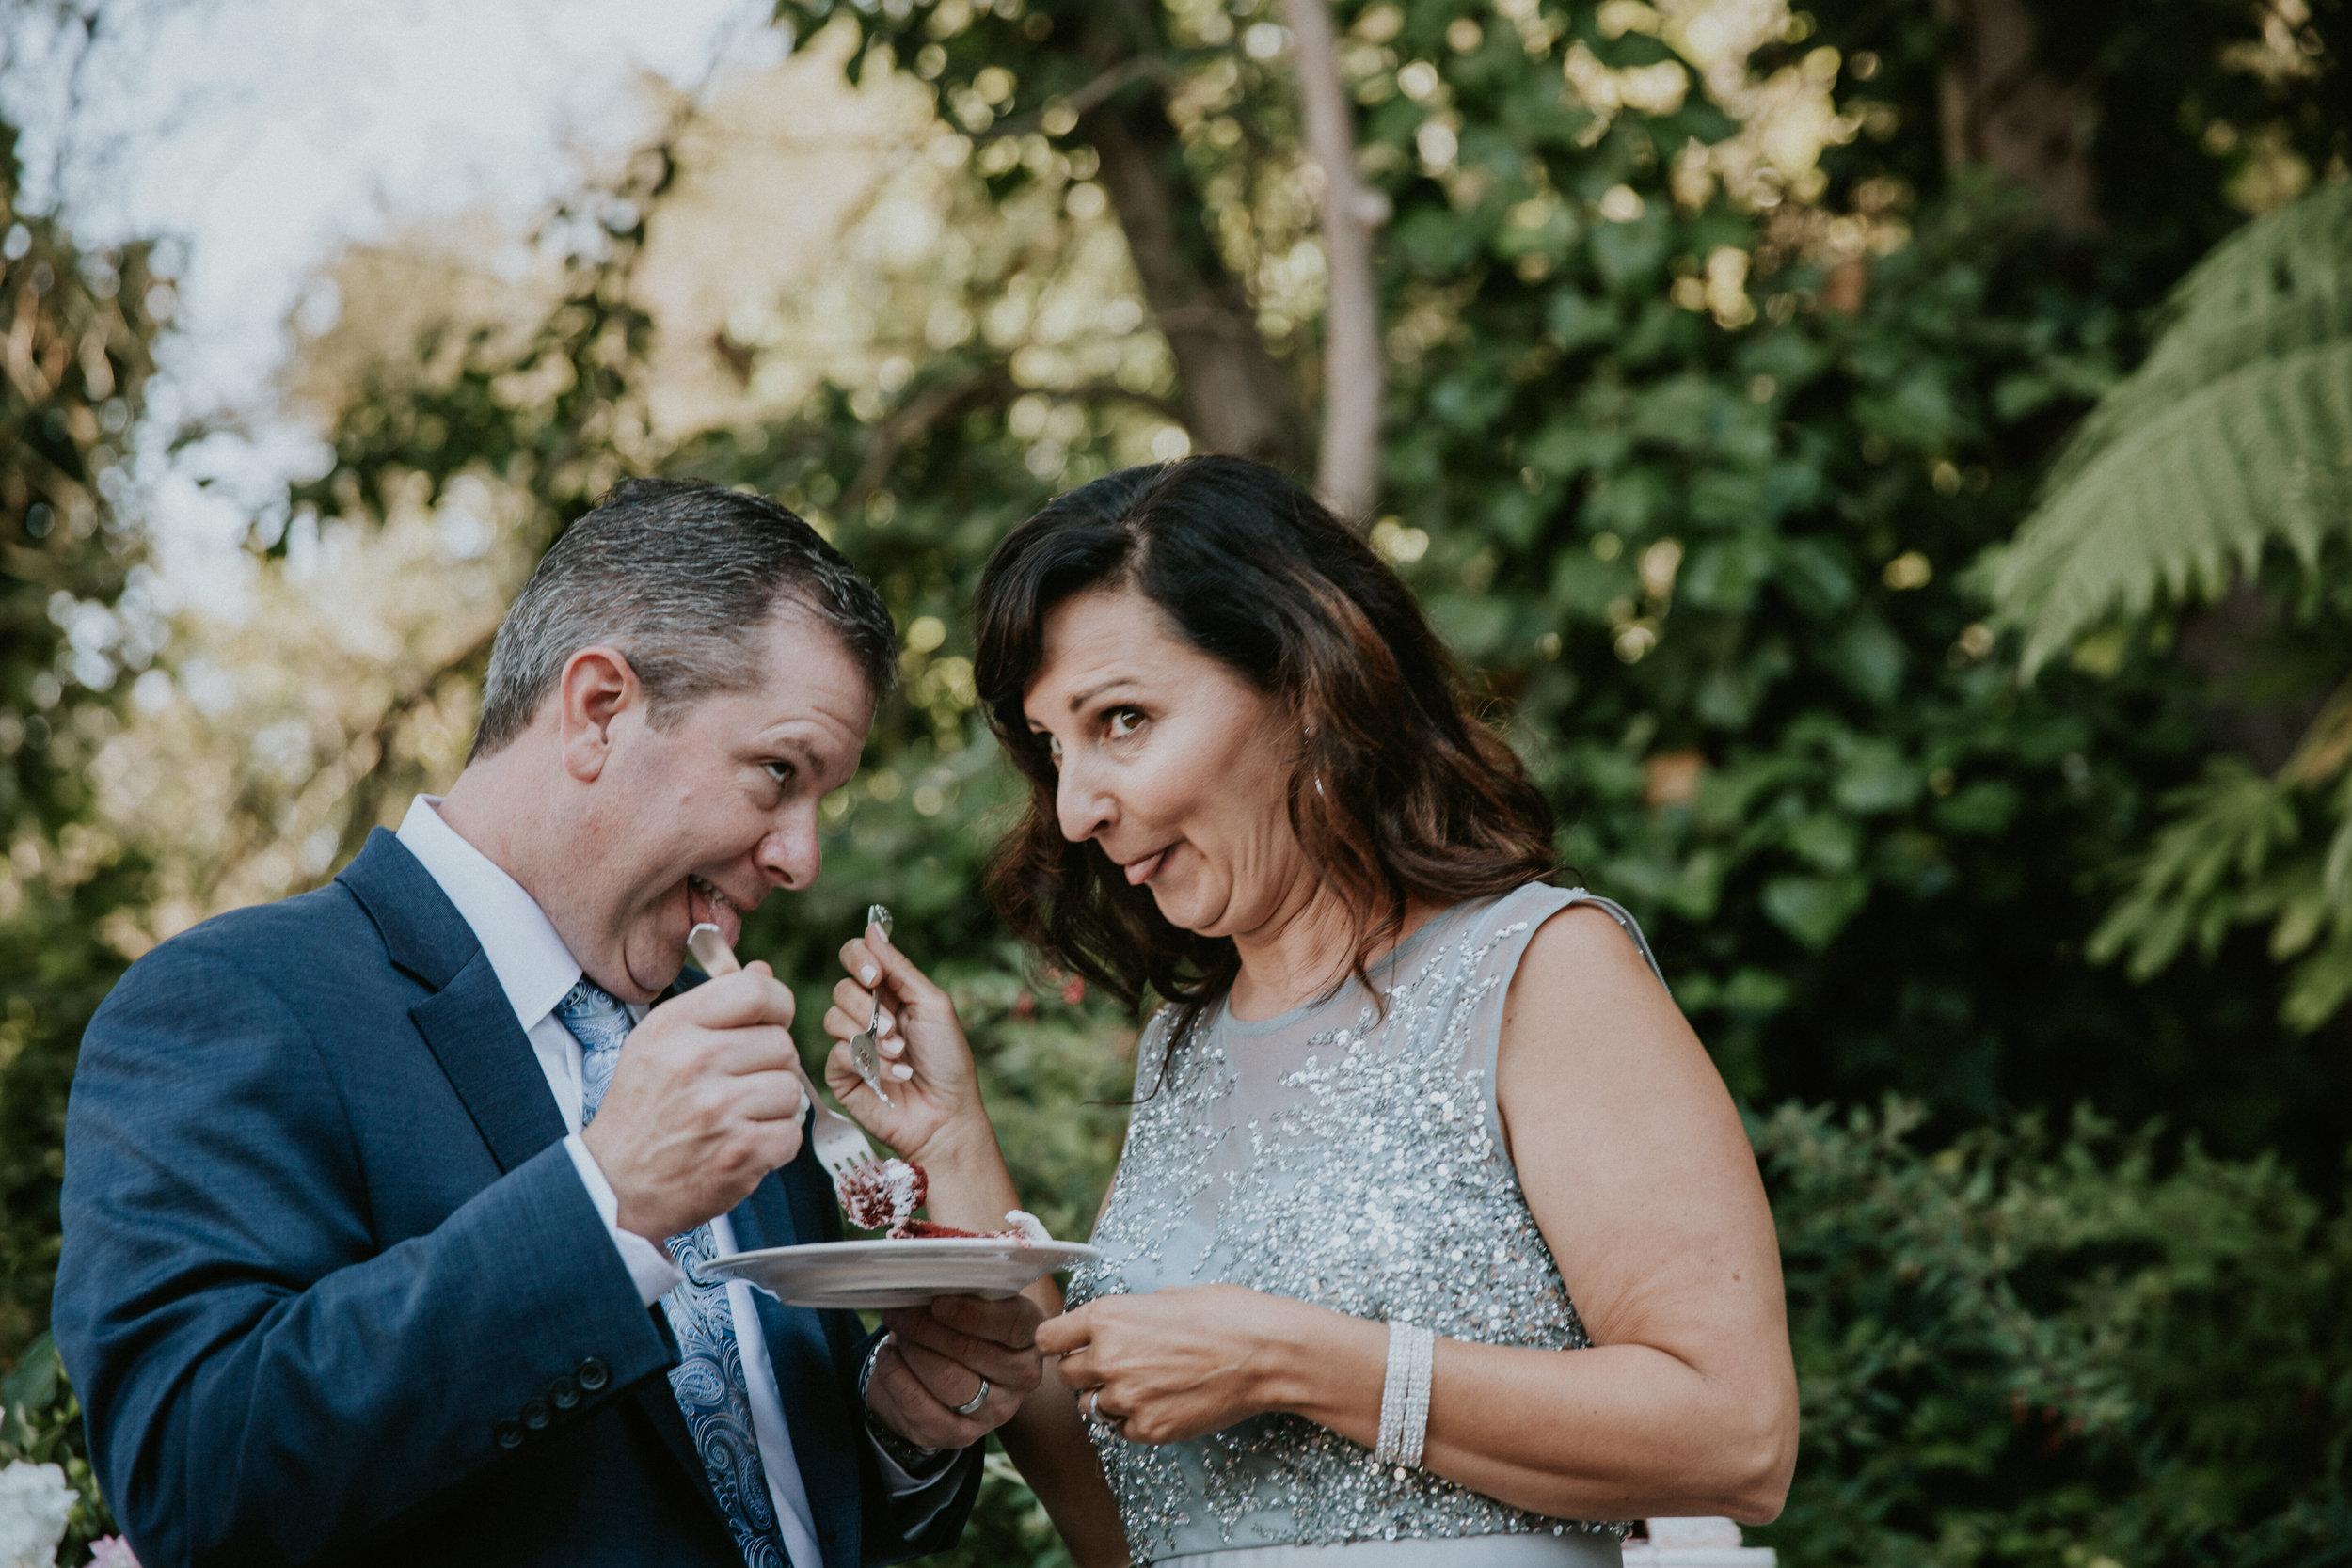 Capitola-Santa-Cruz-wedding-photographer-453.jpg